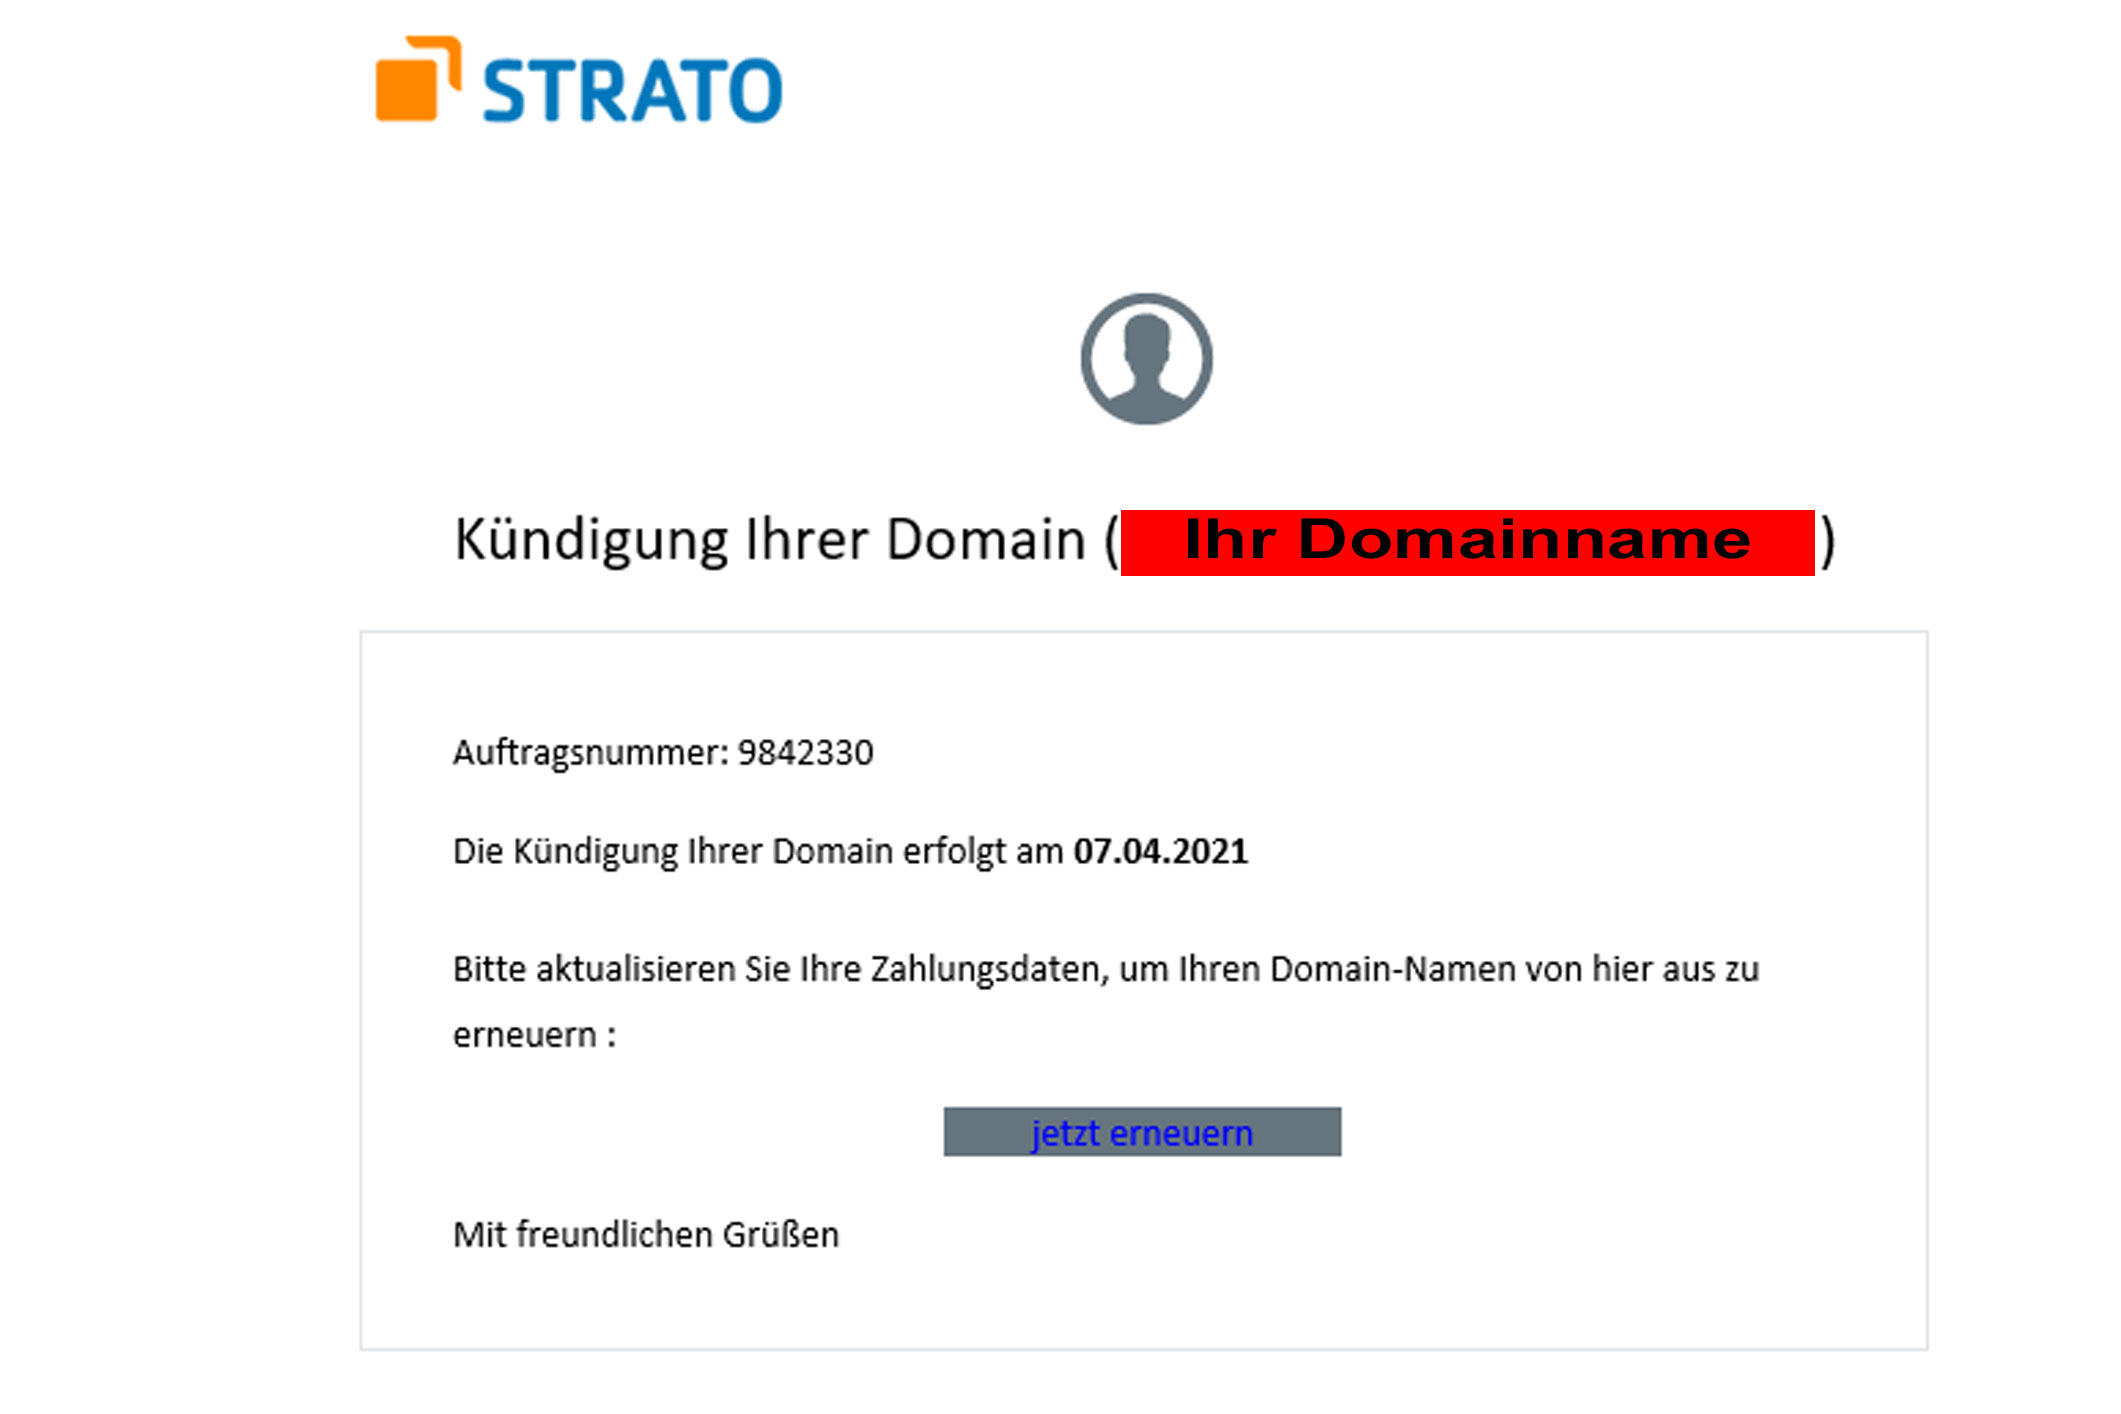 Kündigung Ihrer Domain .....Phishingmail angeblich von STRATO